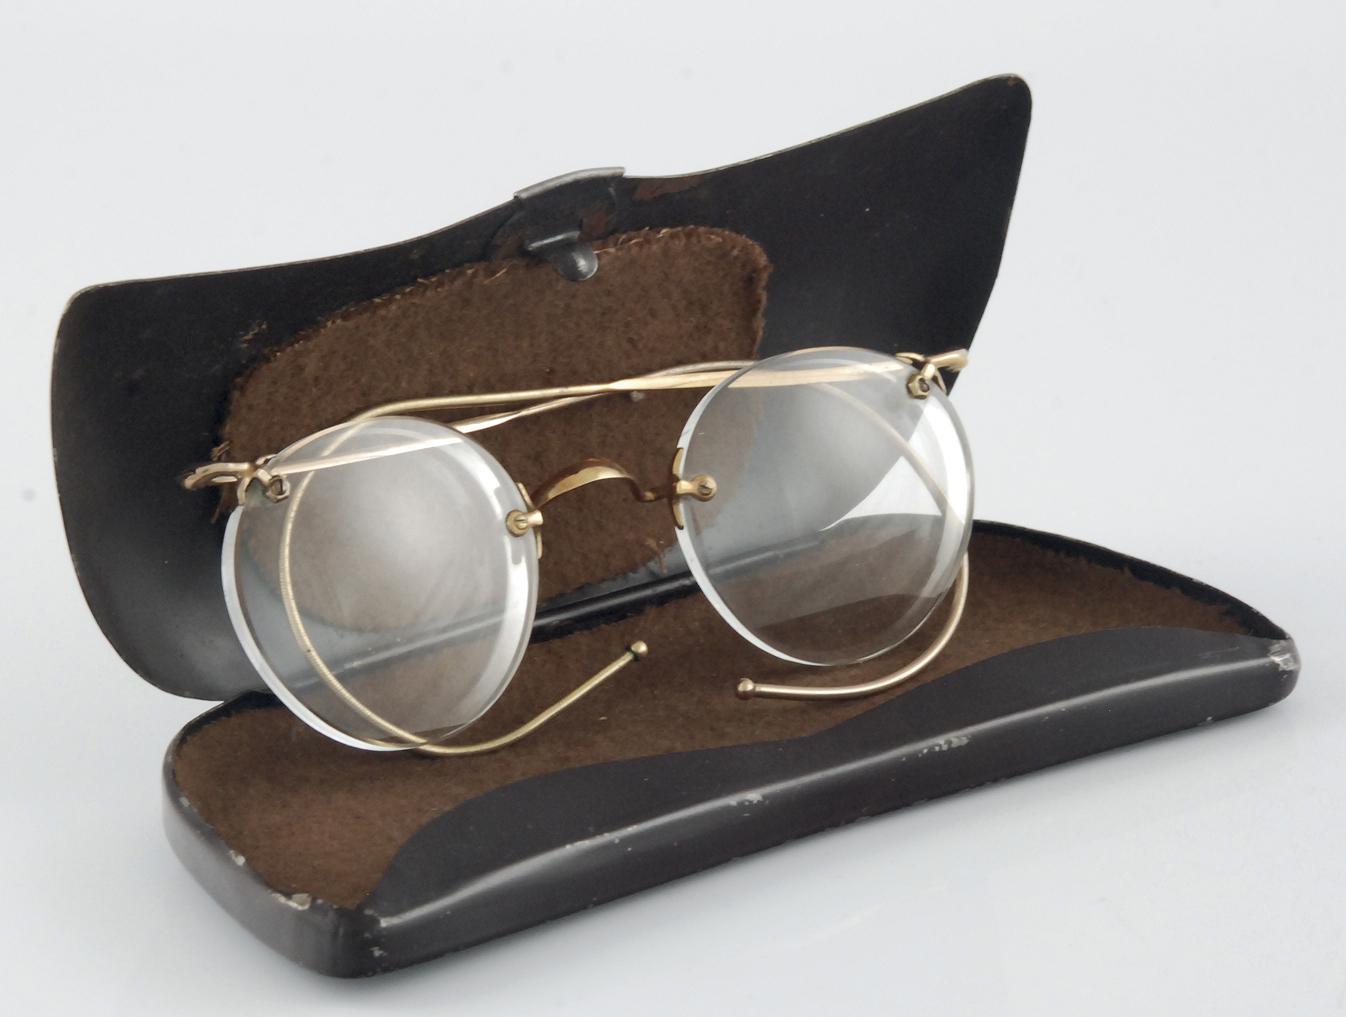 Okulary w etui